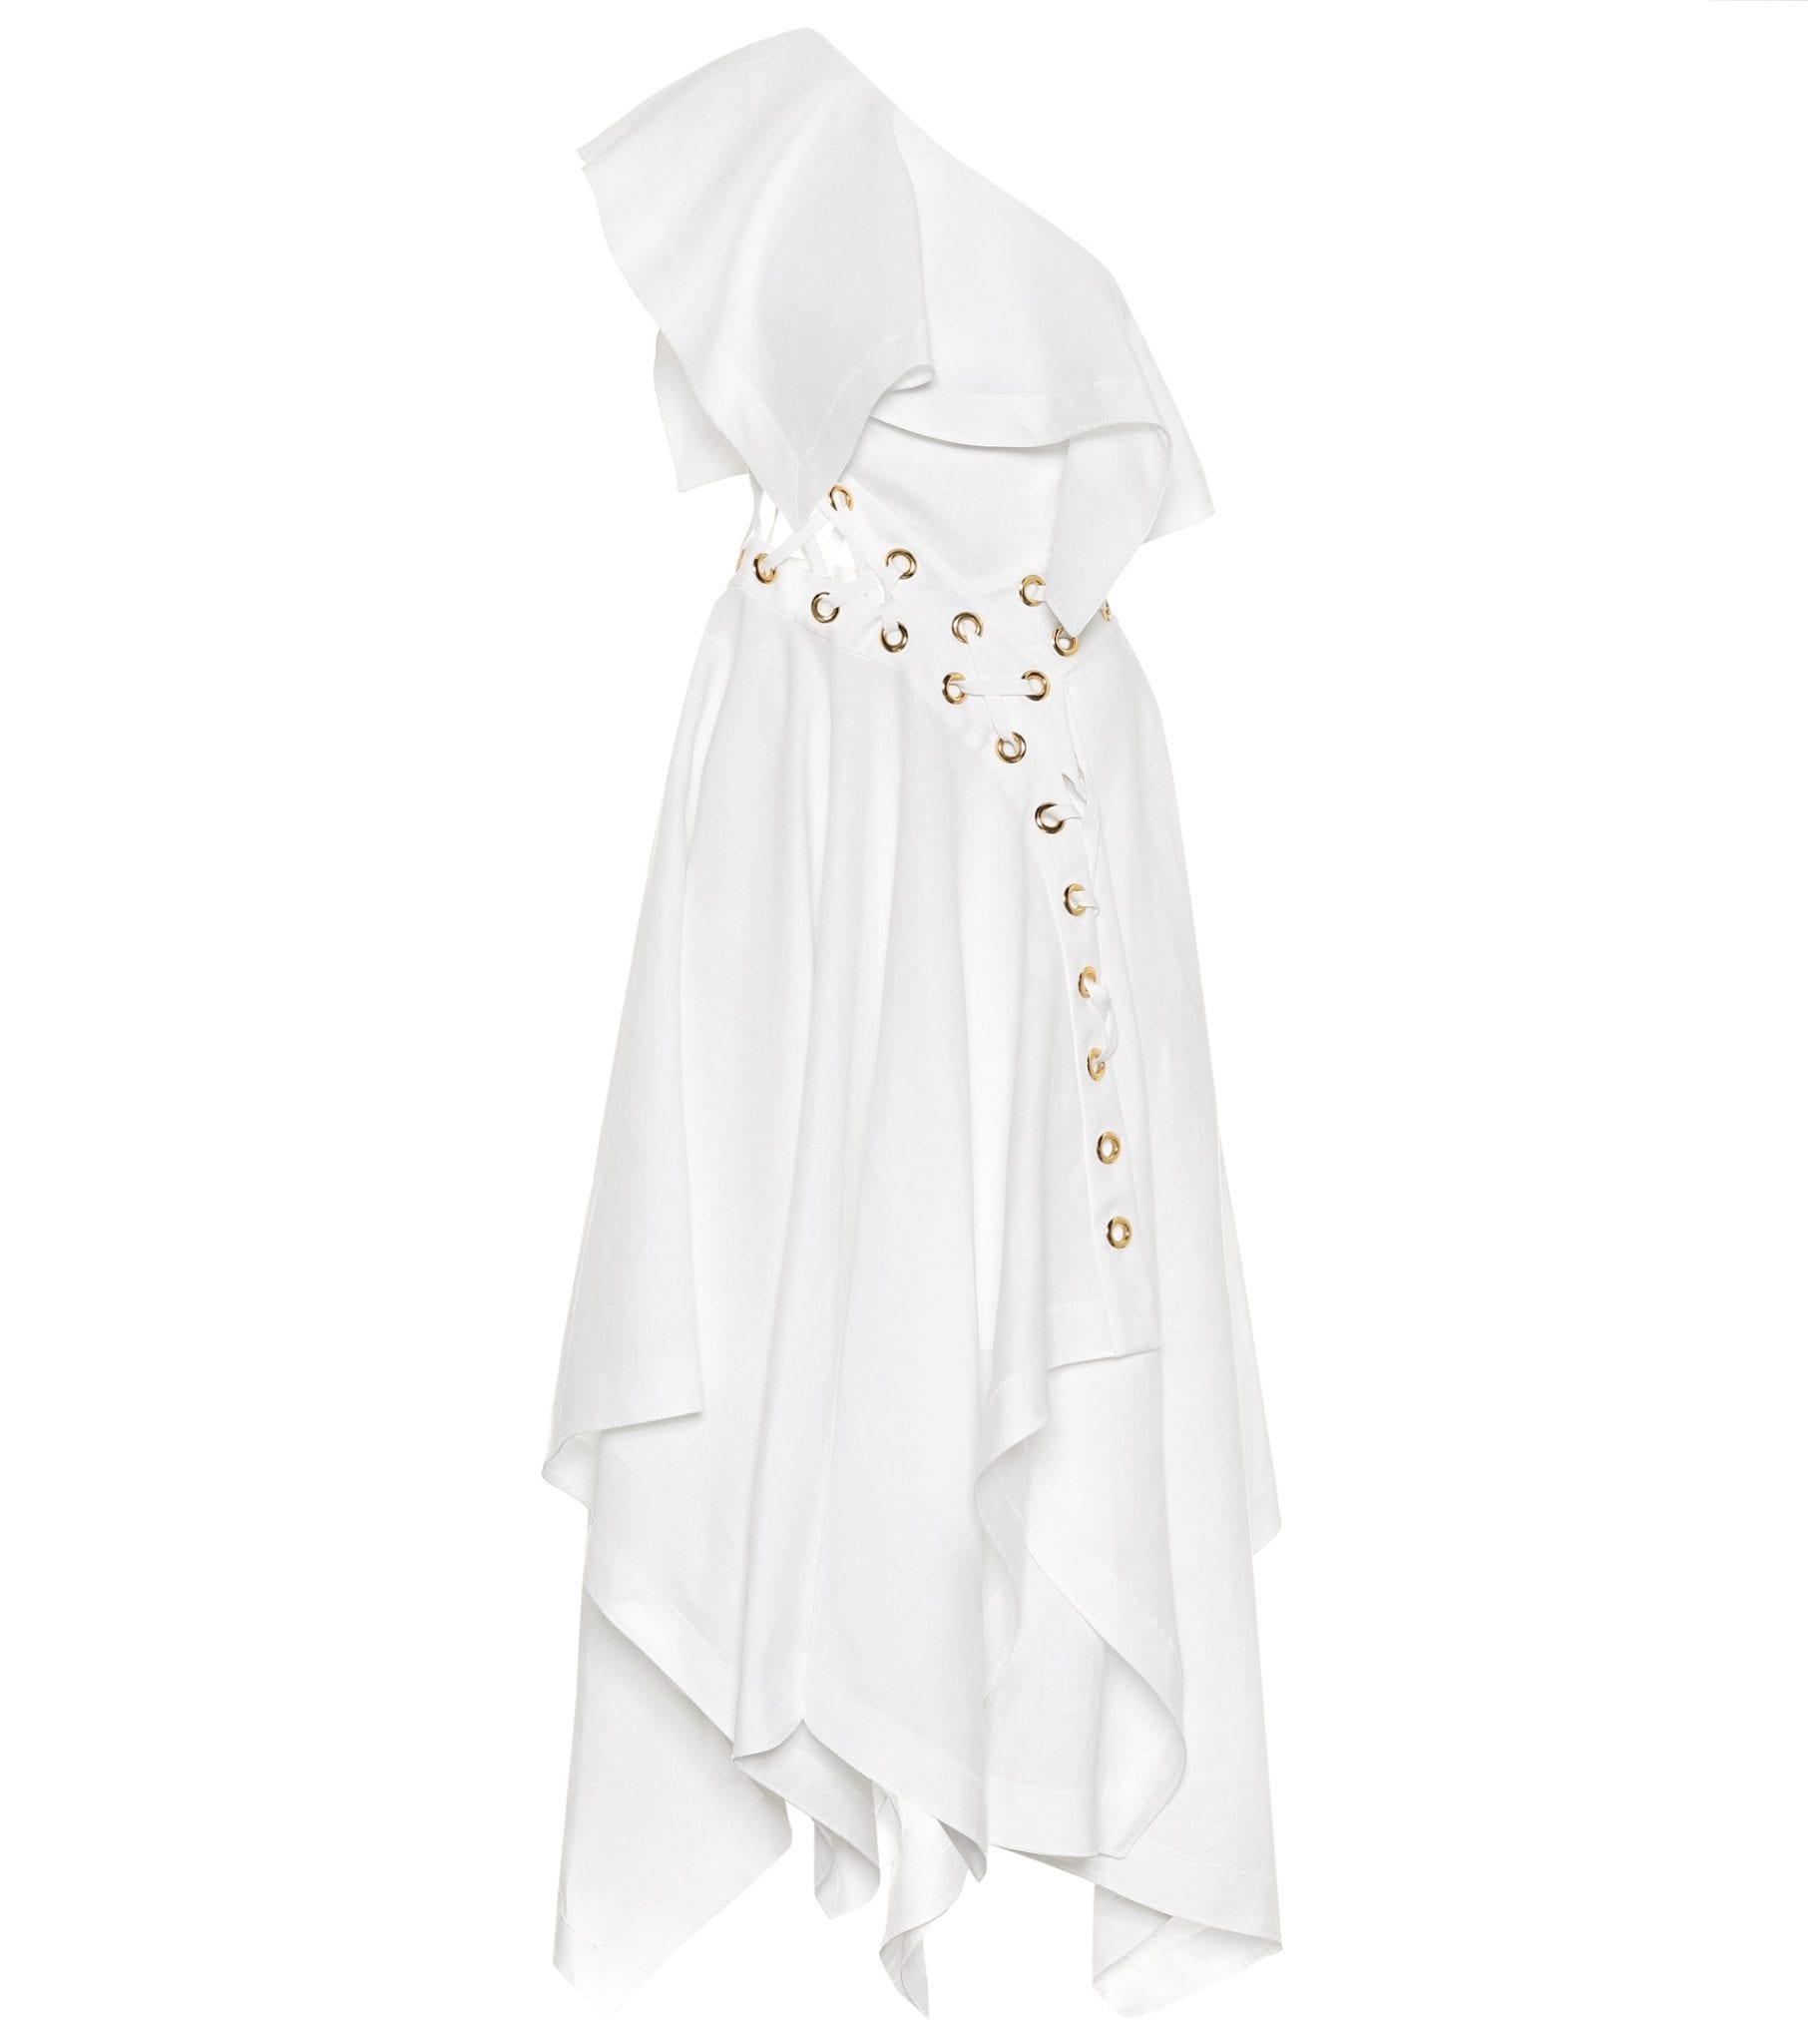 ALEXANDER MCQUEEN One-shoulder Linen Dress